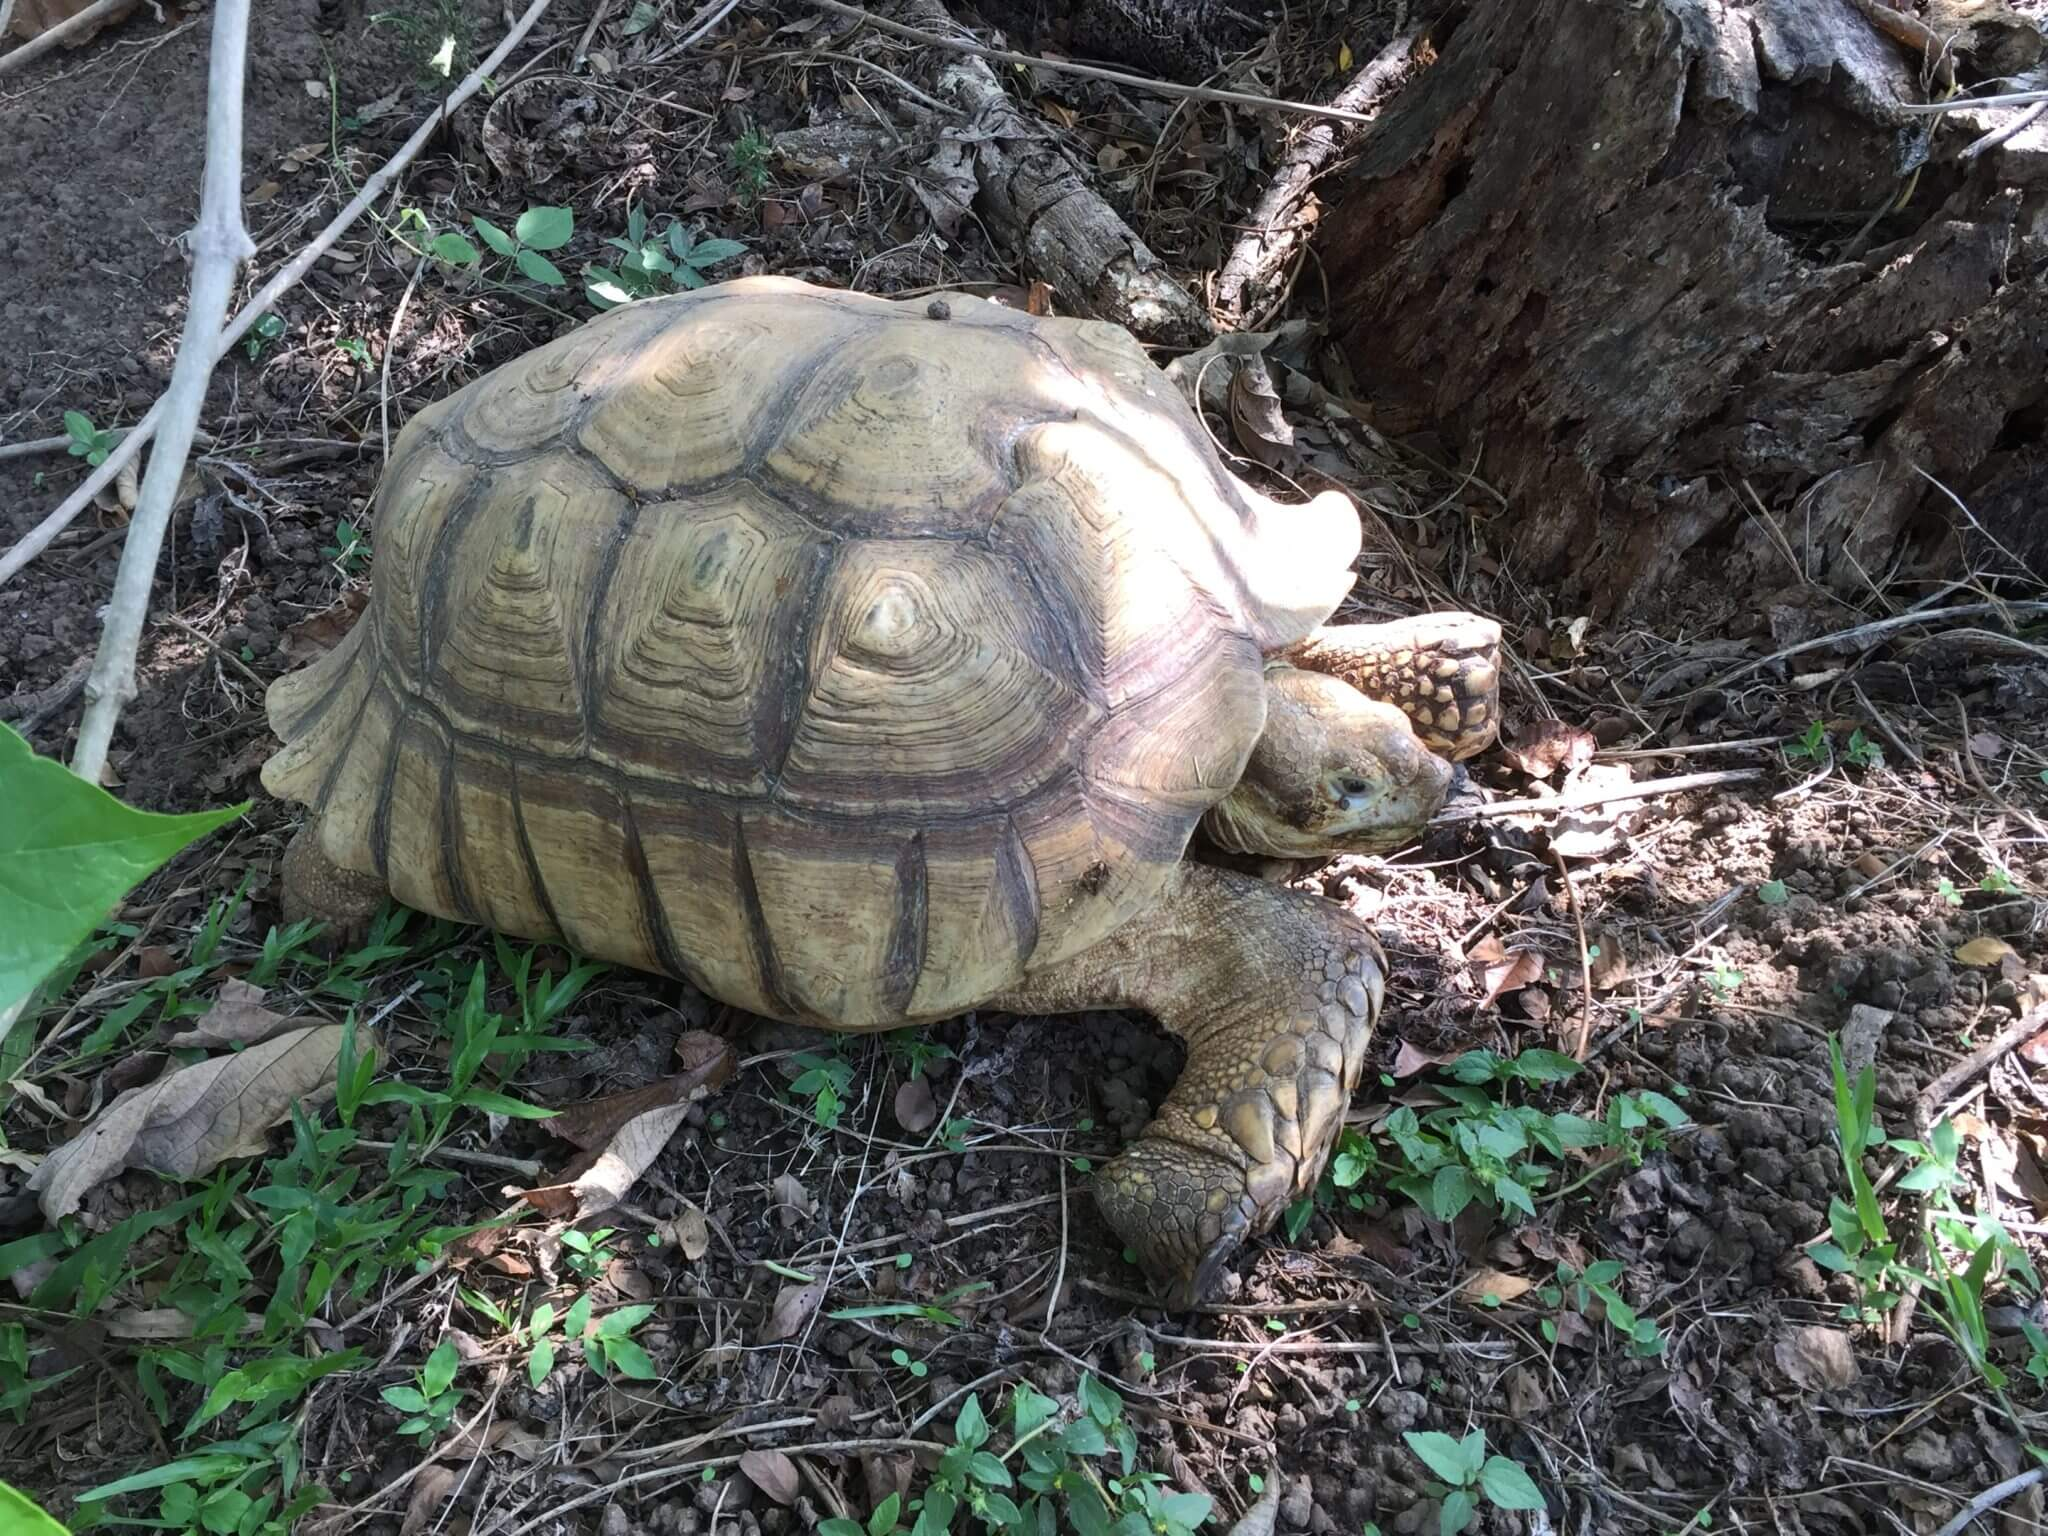 Tortugas (<em>Geochelone sulcata</em>)